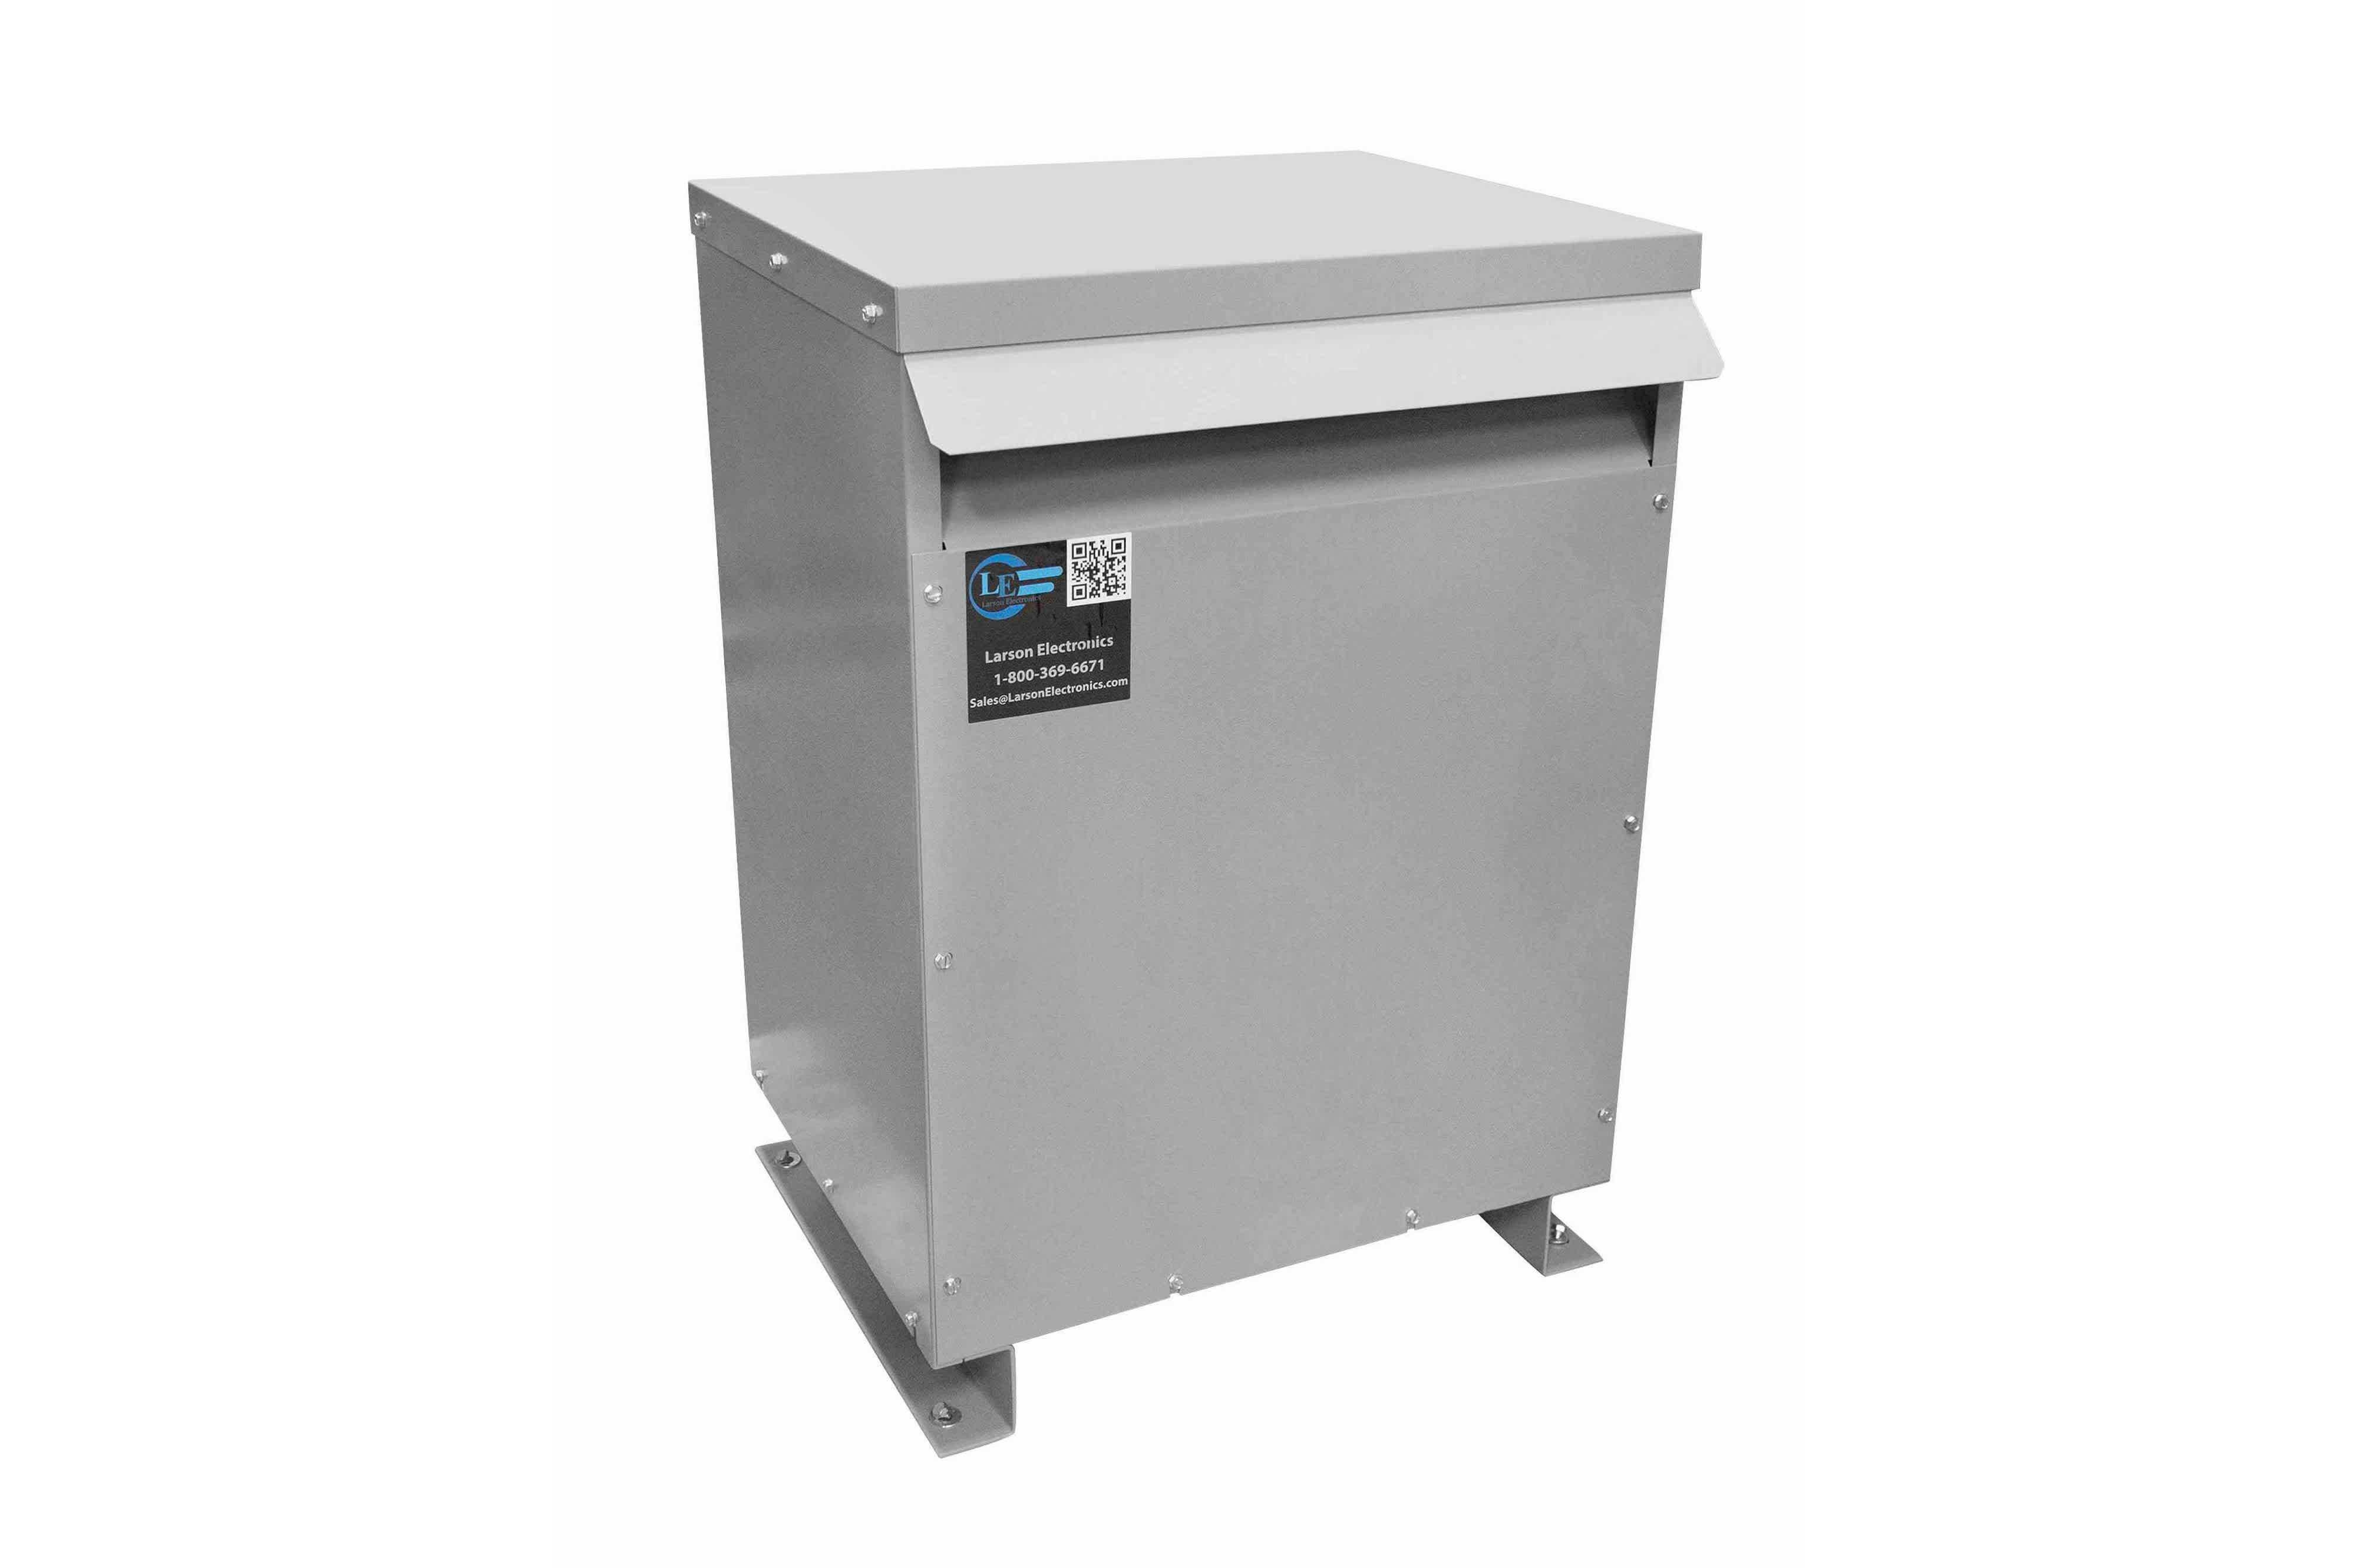 40 kVA 3PH Isolation Transformer, 380V Wye Primary, 240V Delta Secondary, N3R, Ventilated, 60 Hz